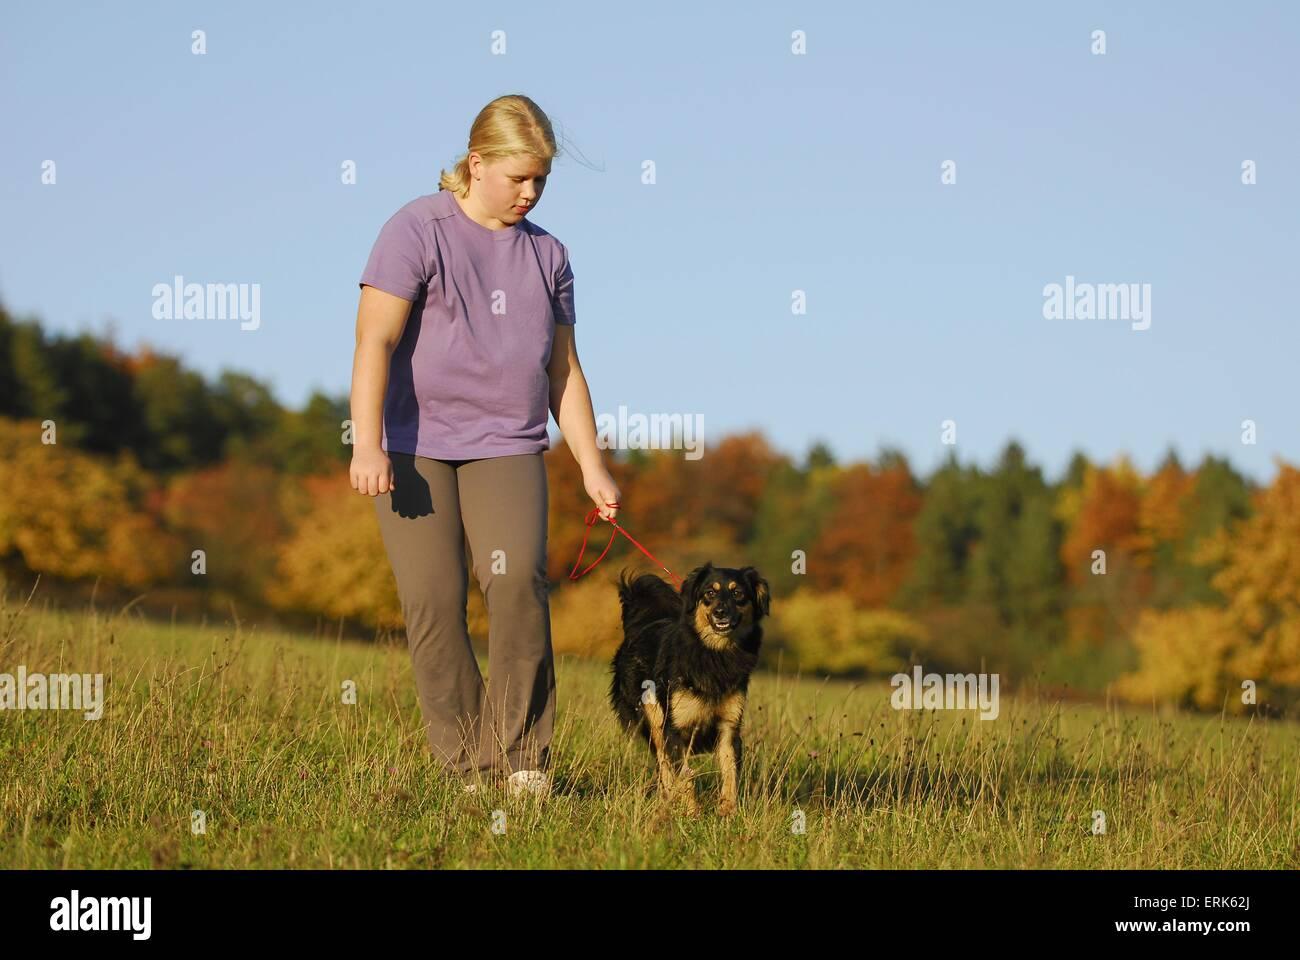 girl with dog - Stock Image